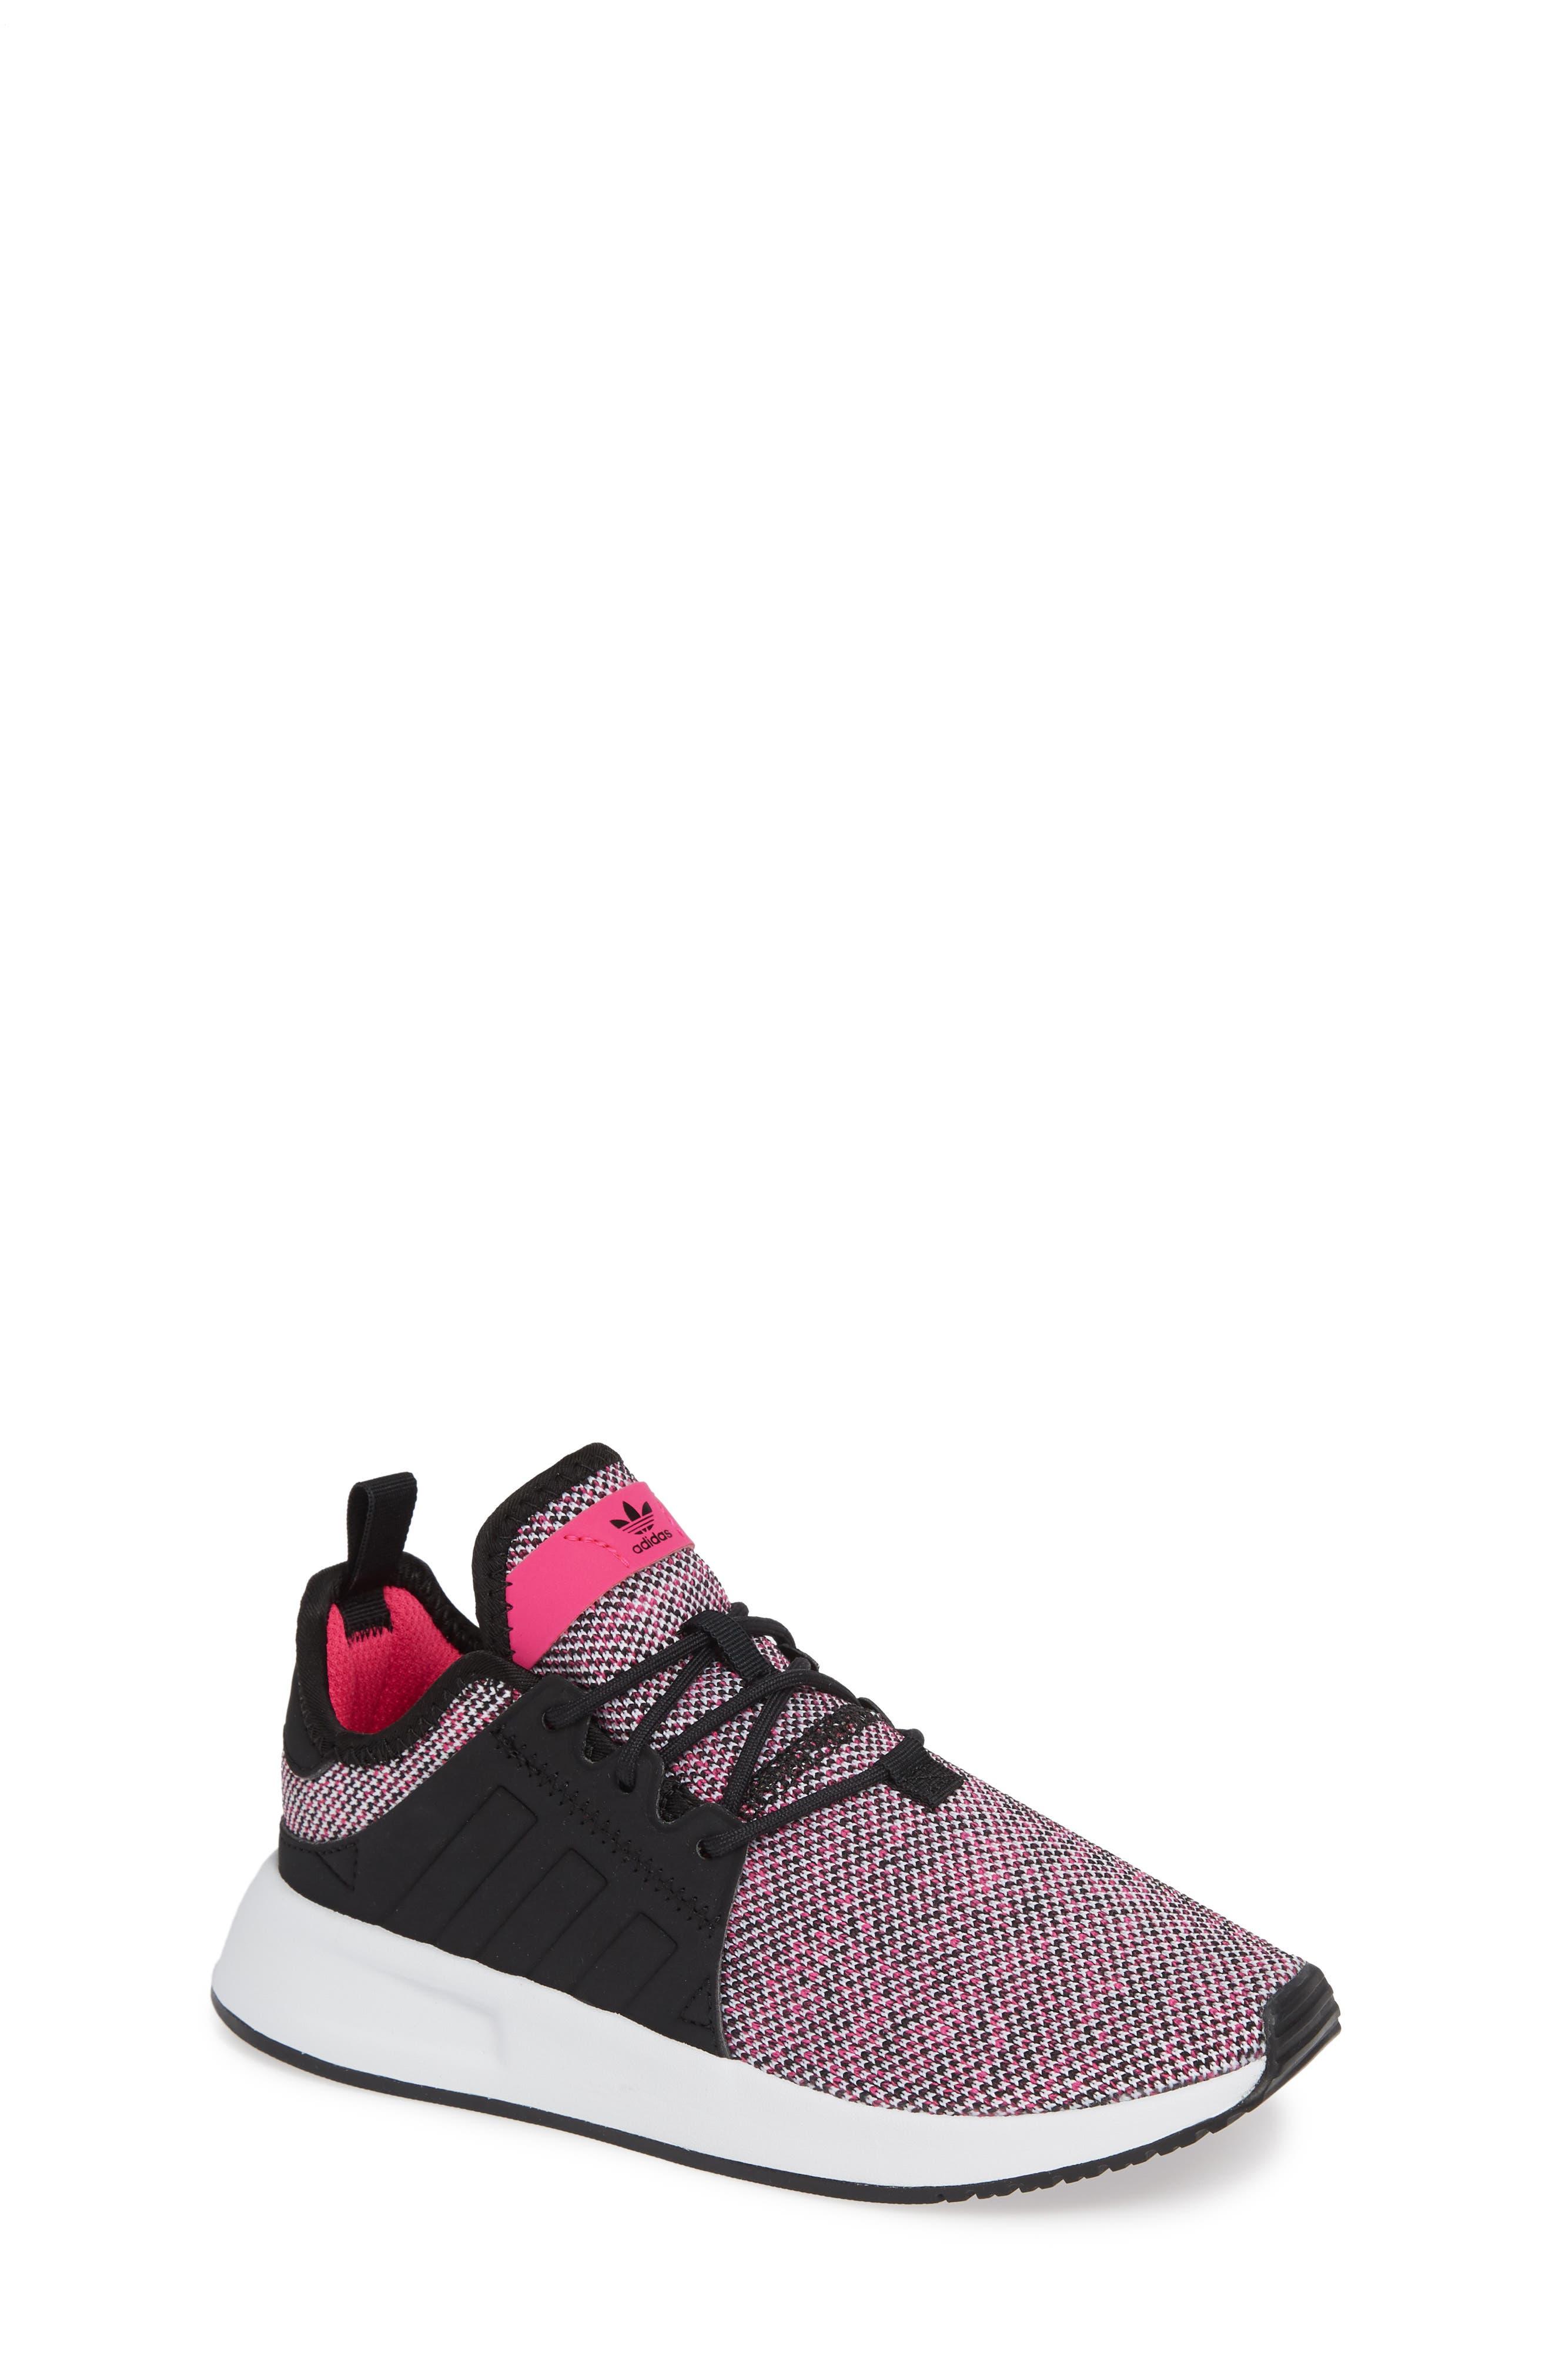 X_PLR Sneaker,                         Main,                         color, Shock Pink/ Black/ White